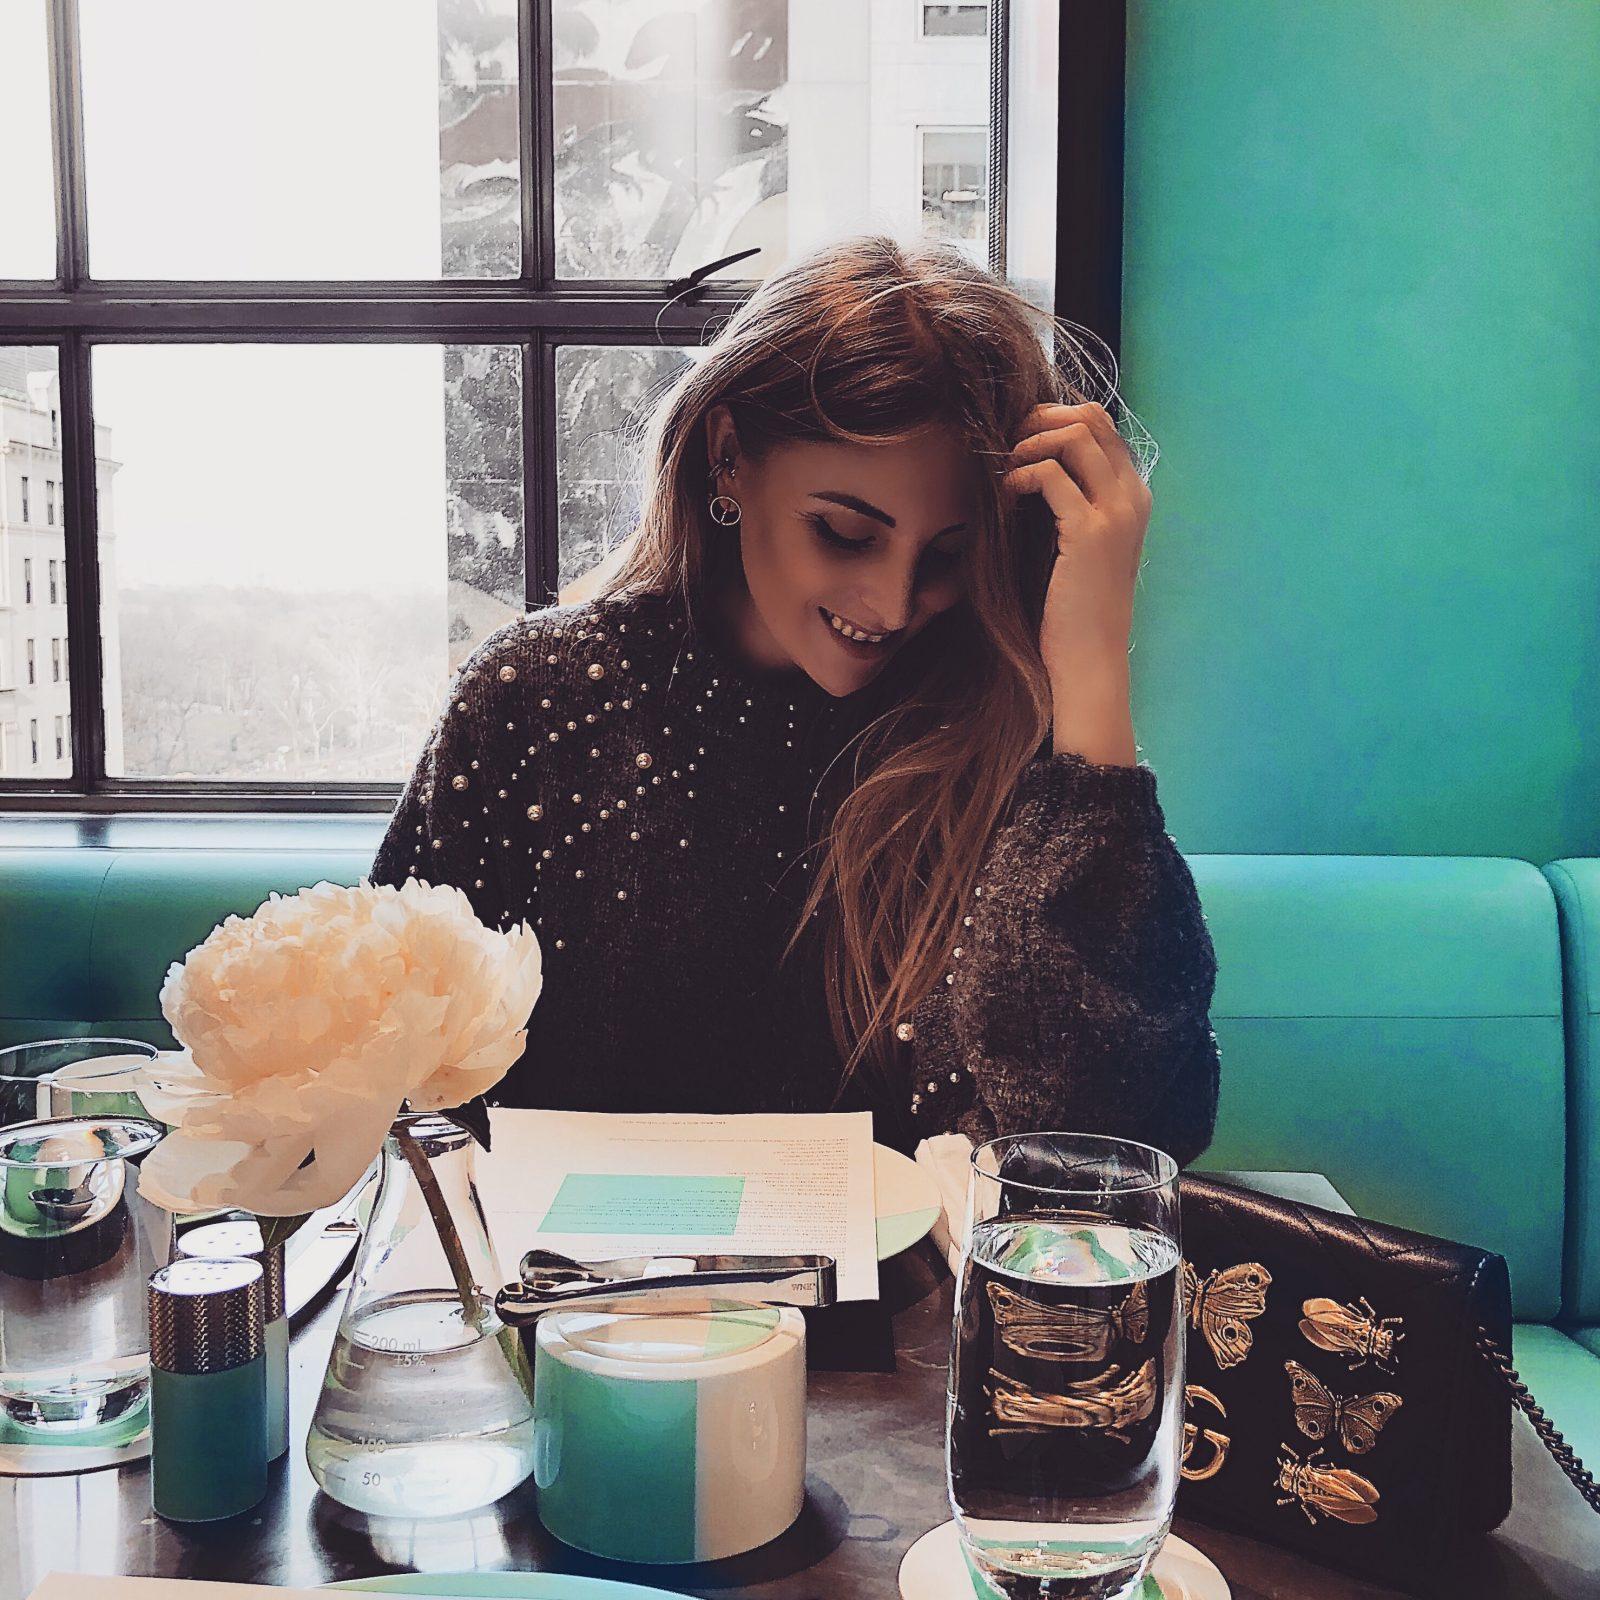 New York in 4 Days - Breakfast at Tiffanys